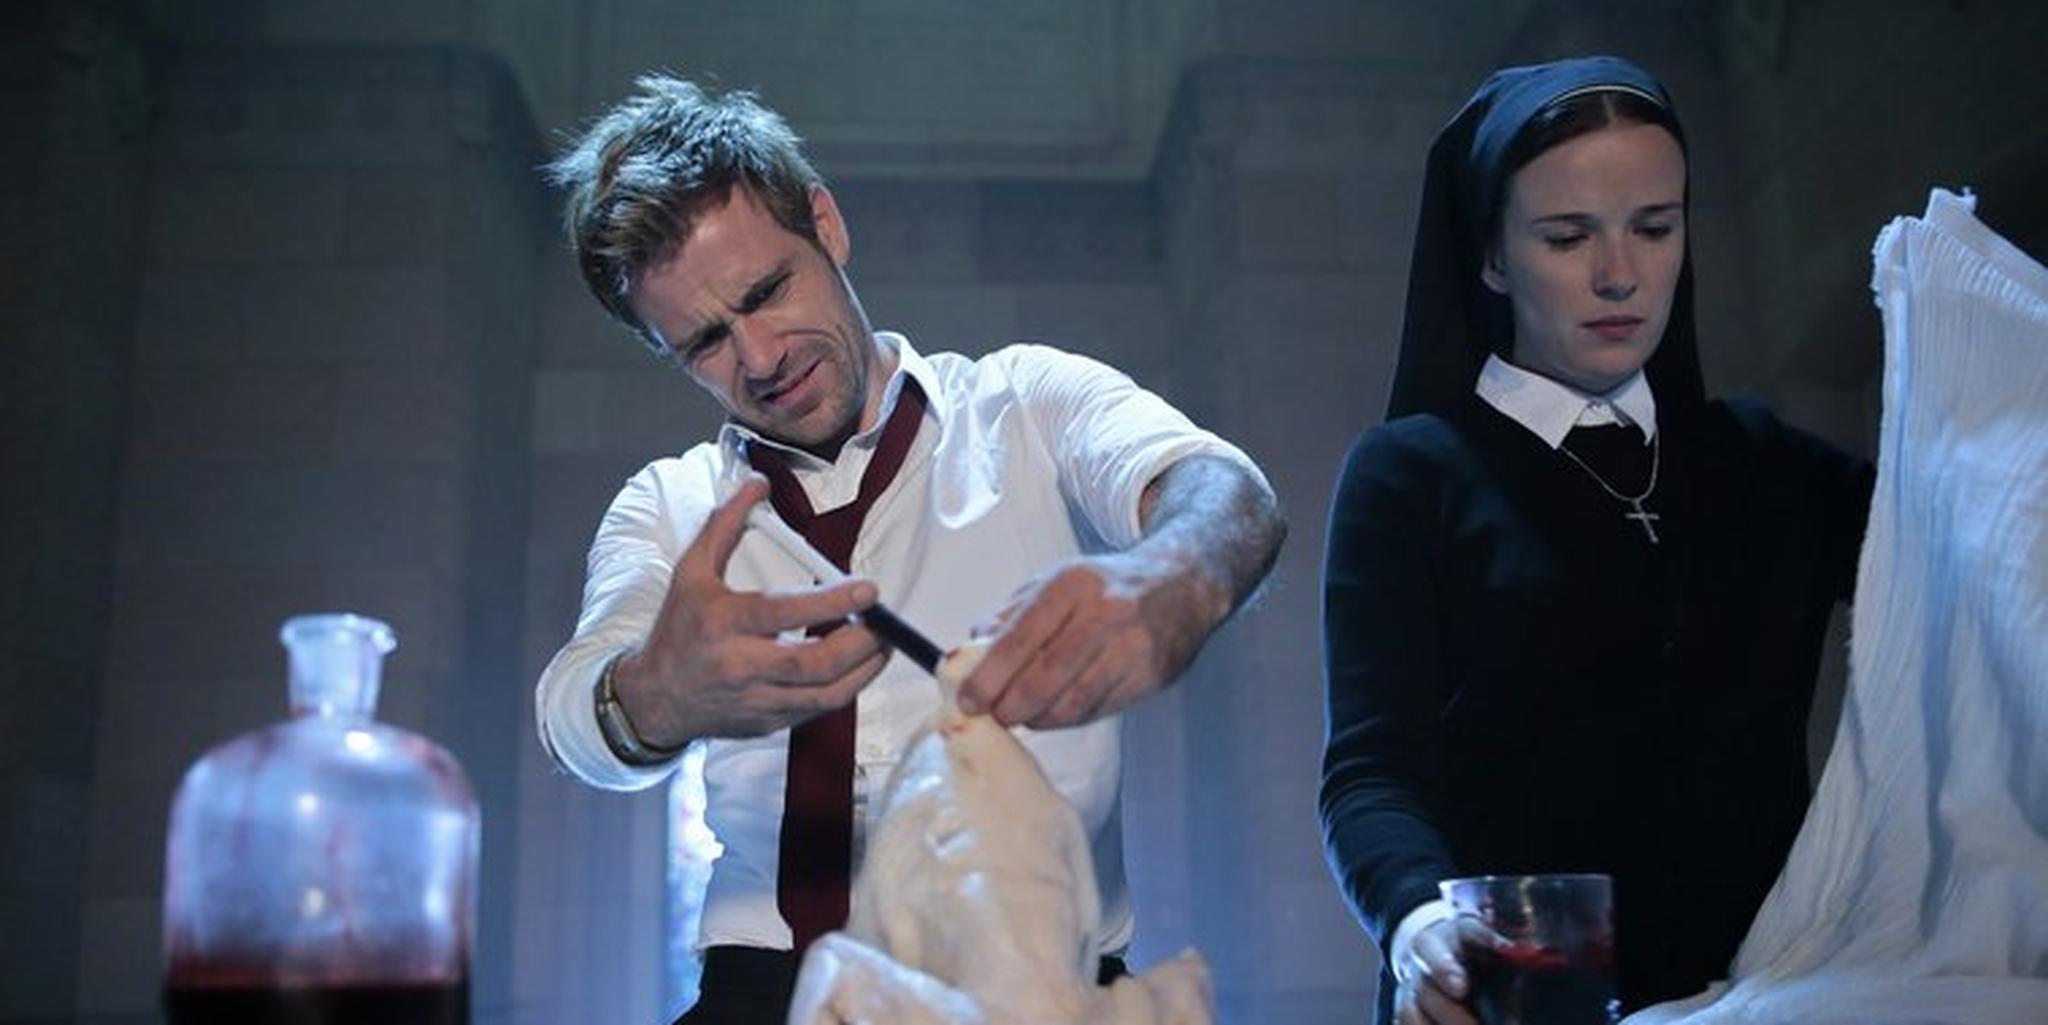 Matt Ryan as Constantine Injecting Chicken